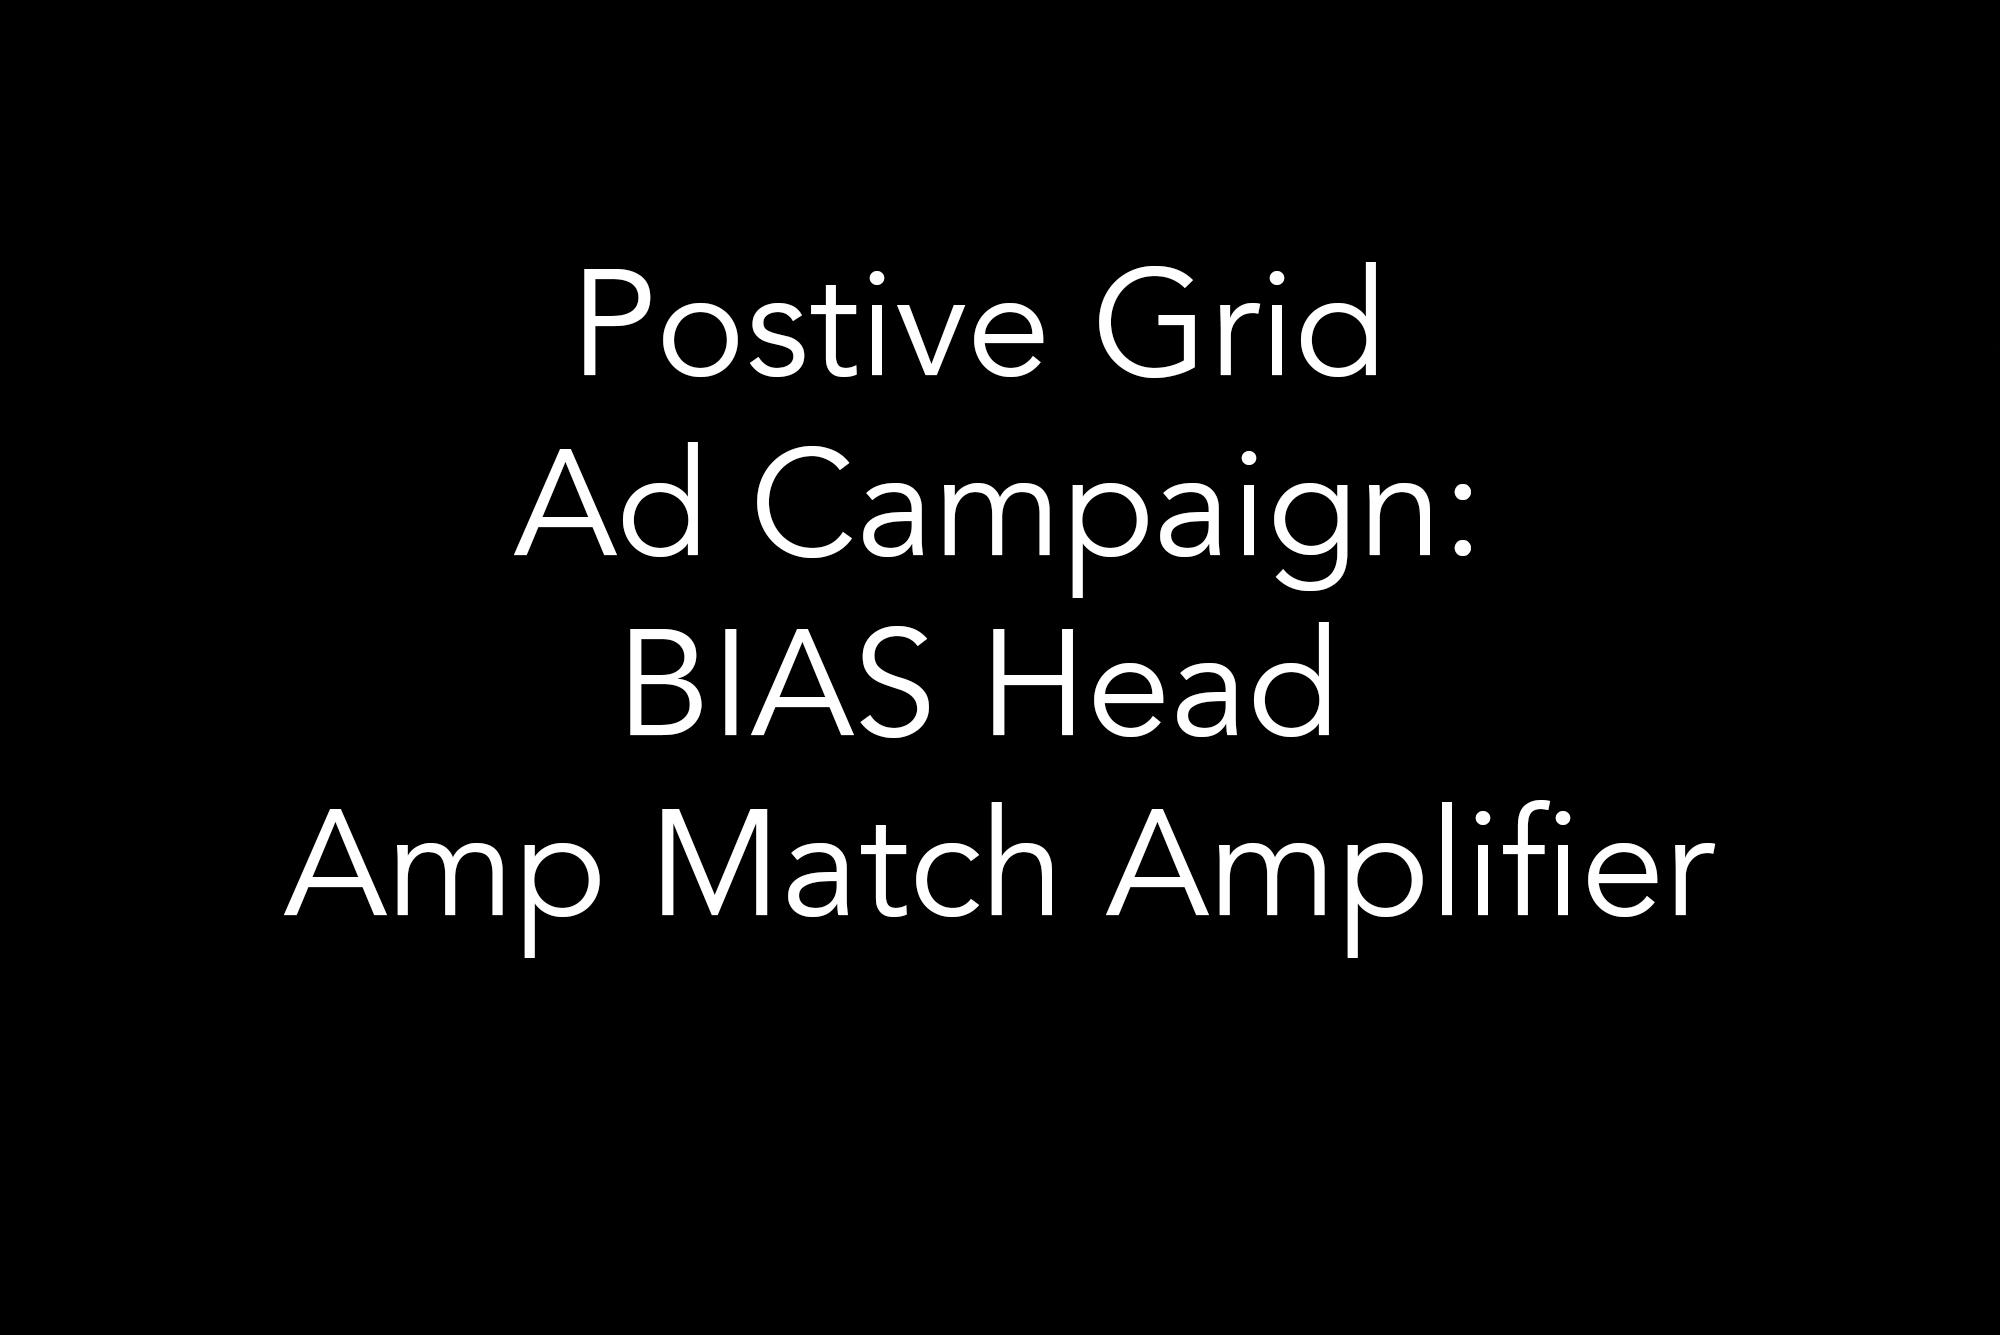 Positive Grid / Ad Campaign / BIAS Head